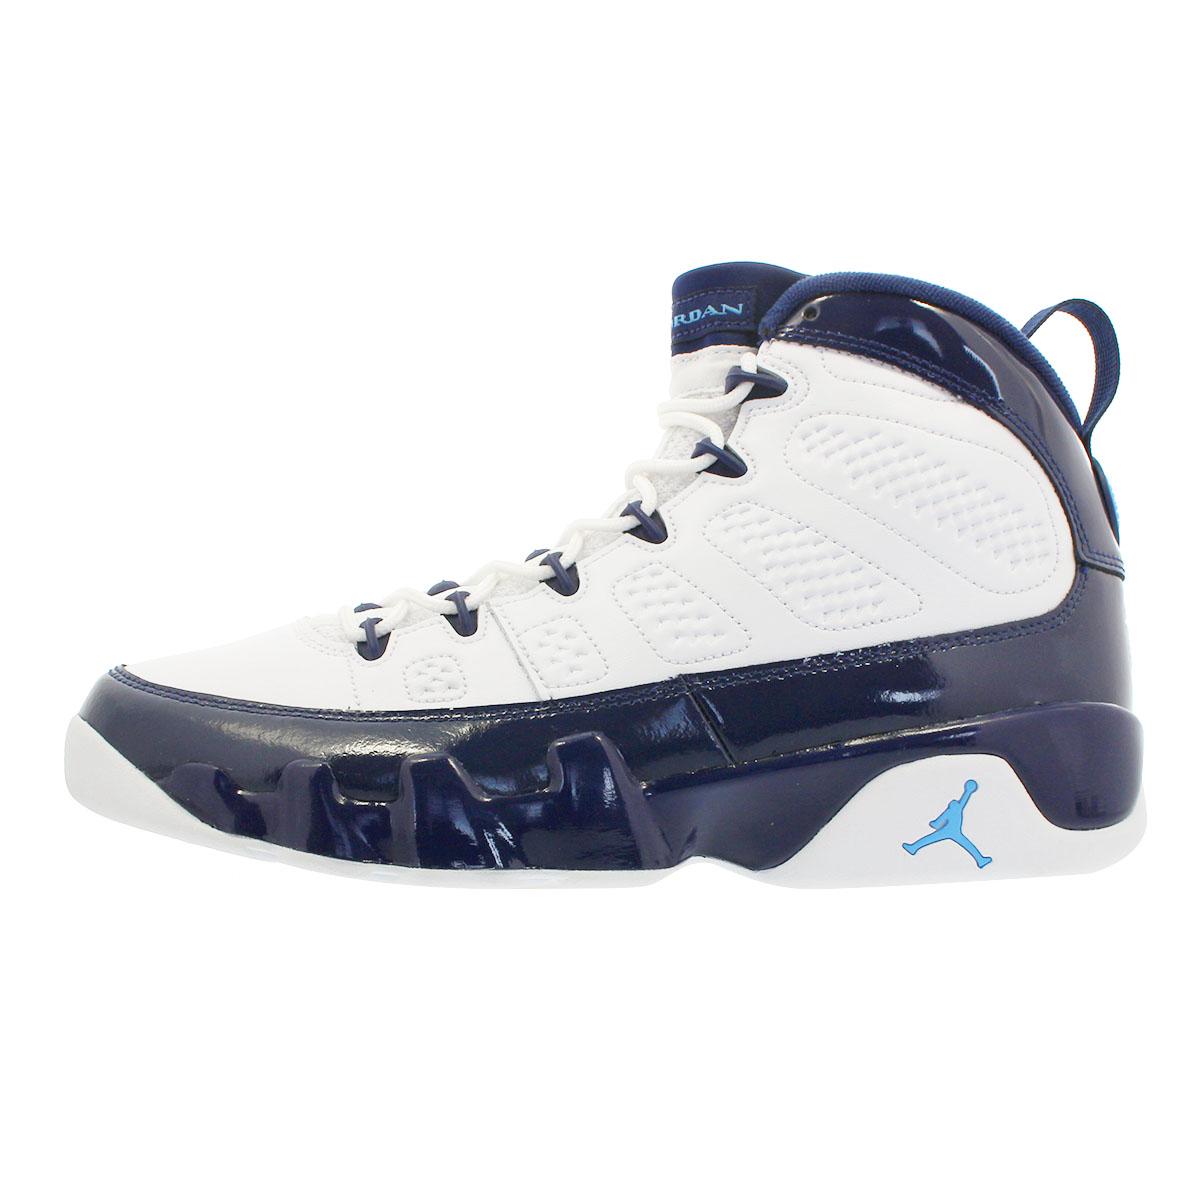 the best attitude d4cd9 dad6b NIKE AIR JORDAN 9 RETRO Nike air Jordan 9 nostalgic WHITE/MIDNIGHT  NAVY/UNIVERSITY BLUE 302,370-145